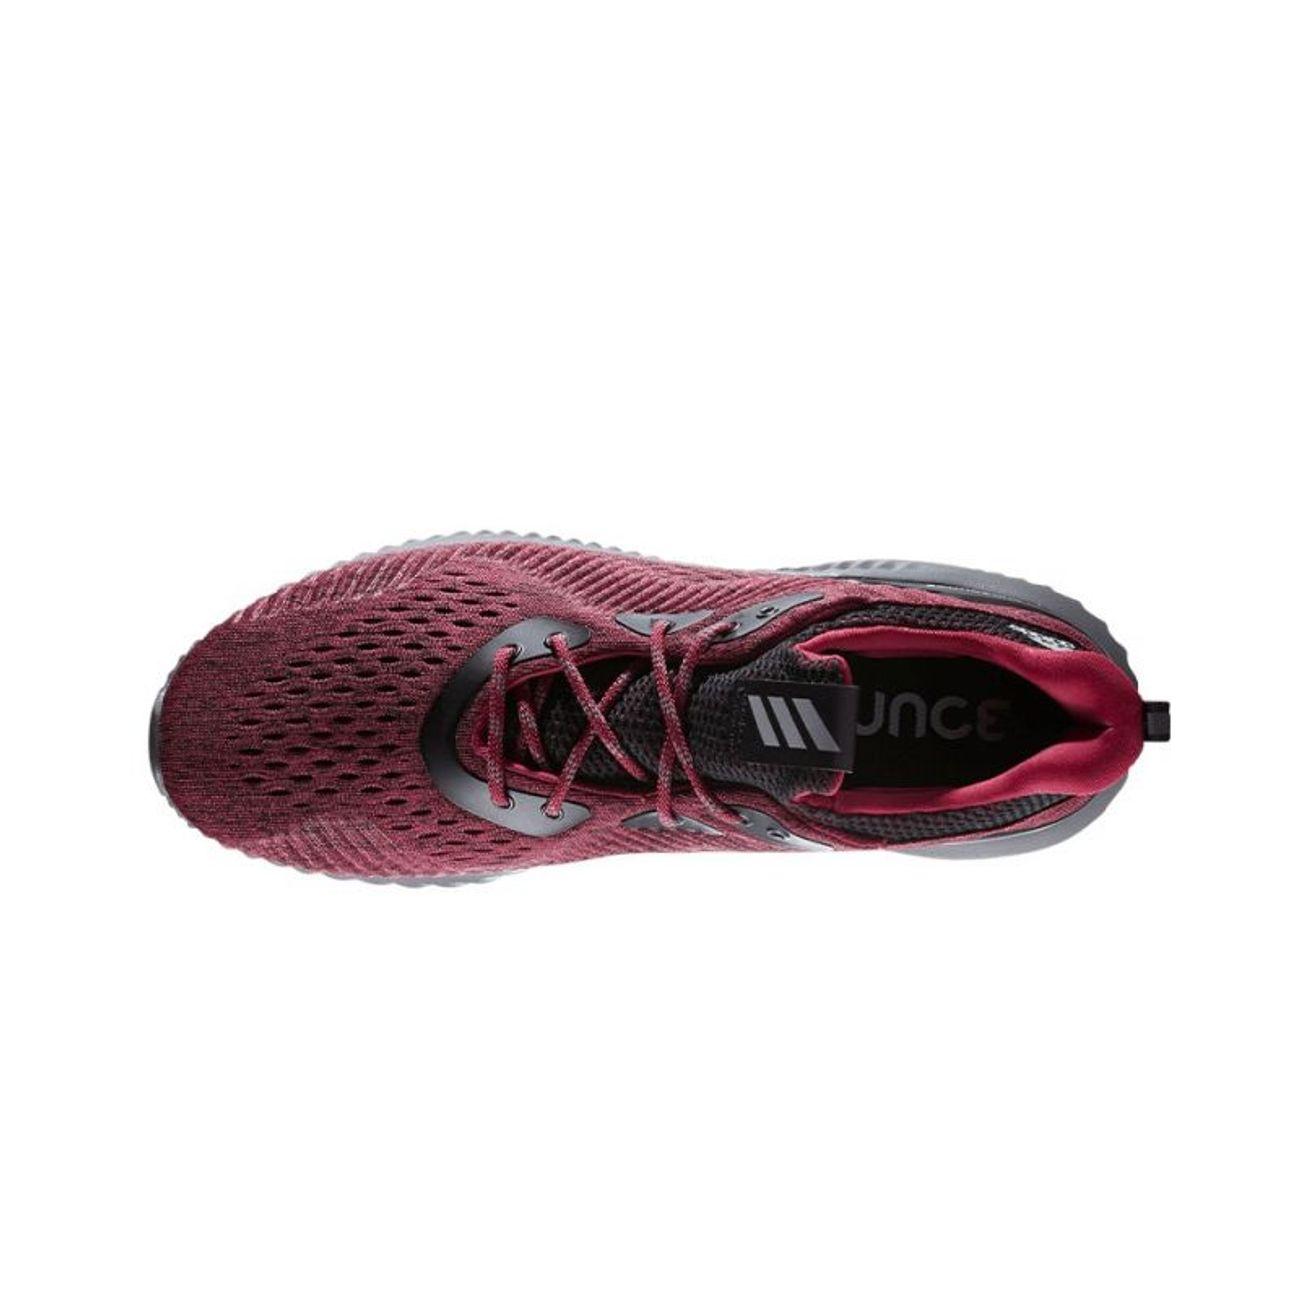 Alphabounce Bw1204 Adulte Padel Em Adidas Rubis Noir H9IDWEYe2